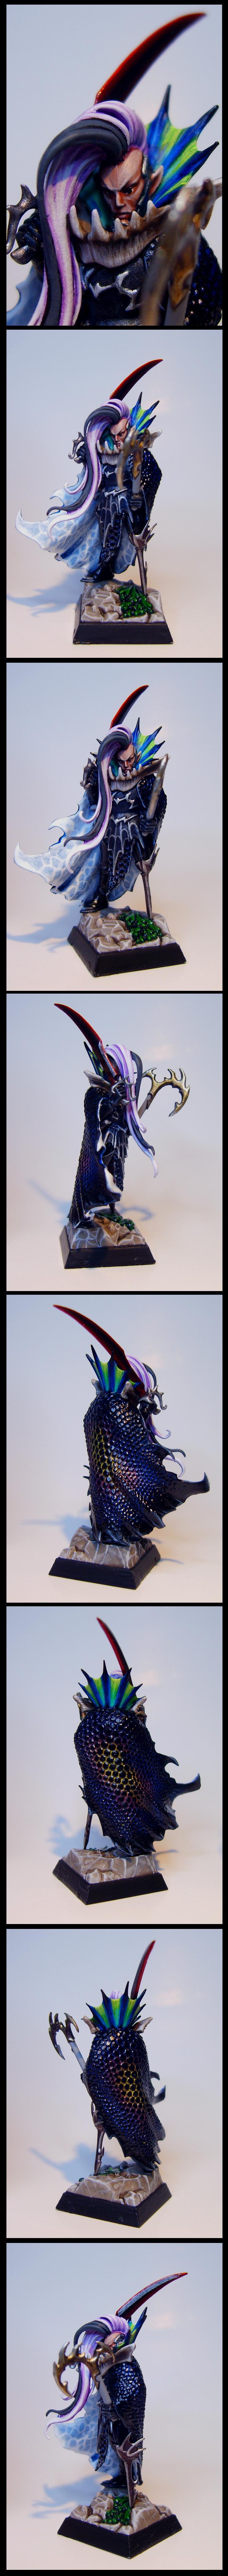 Black, Colour, Dark Elves, Dragon Cape, Eldar, Fleet Master, Pirate, Rainbow